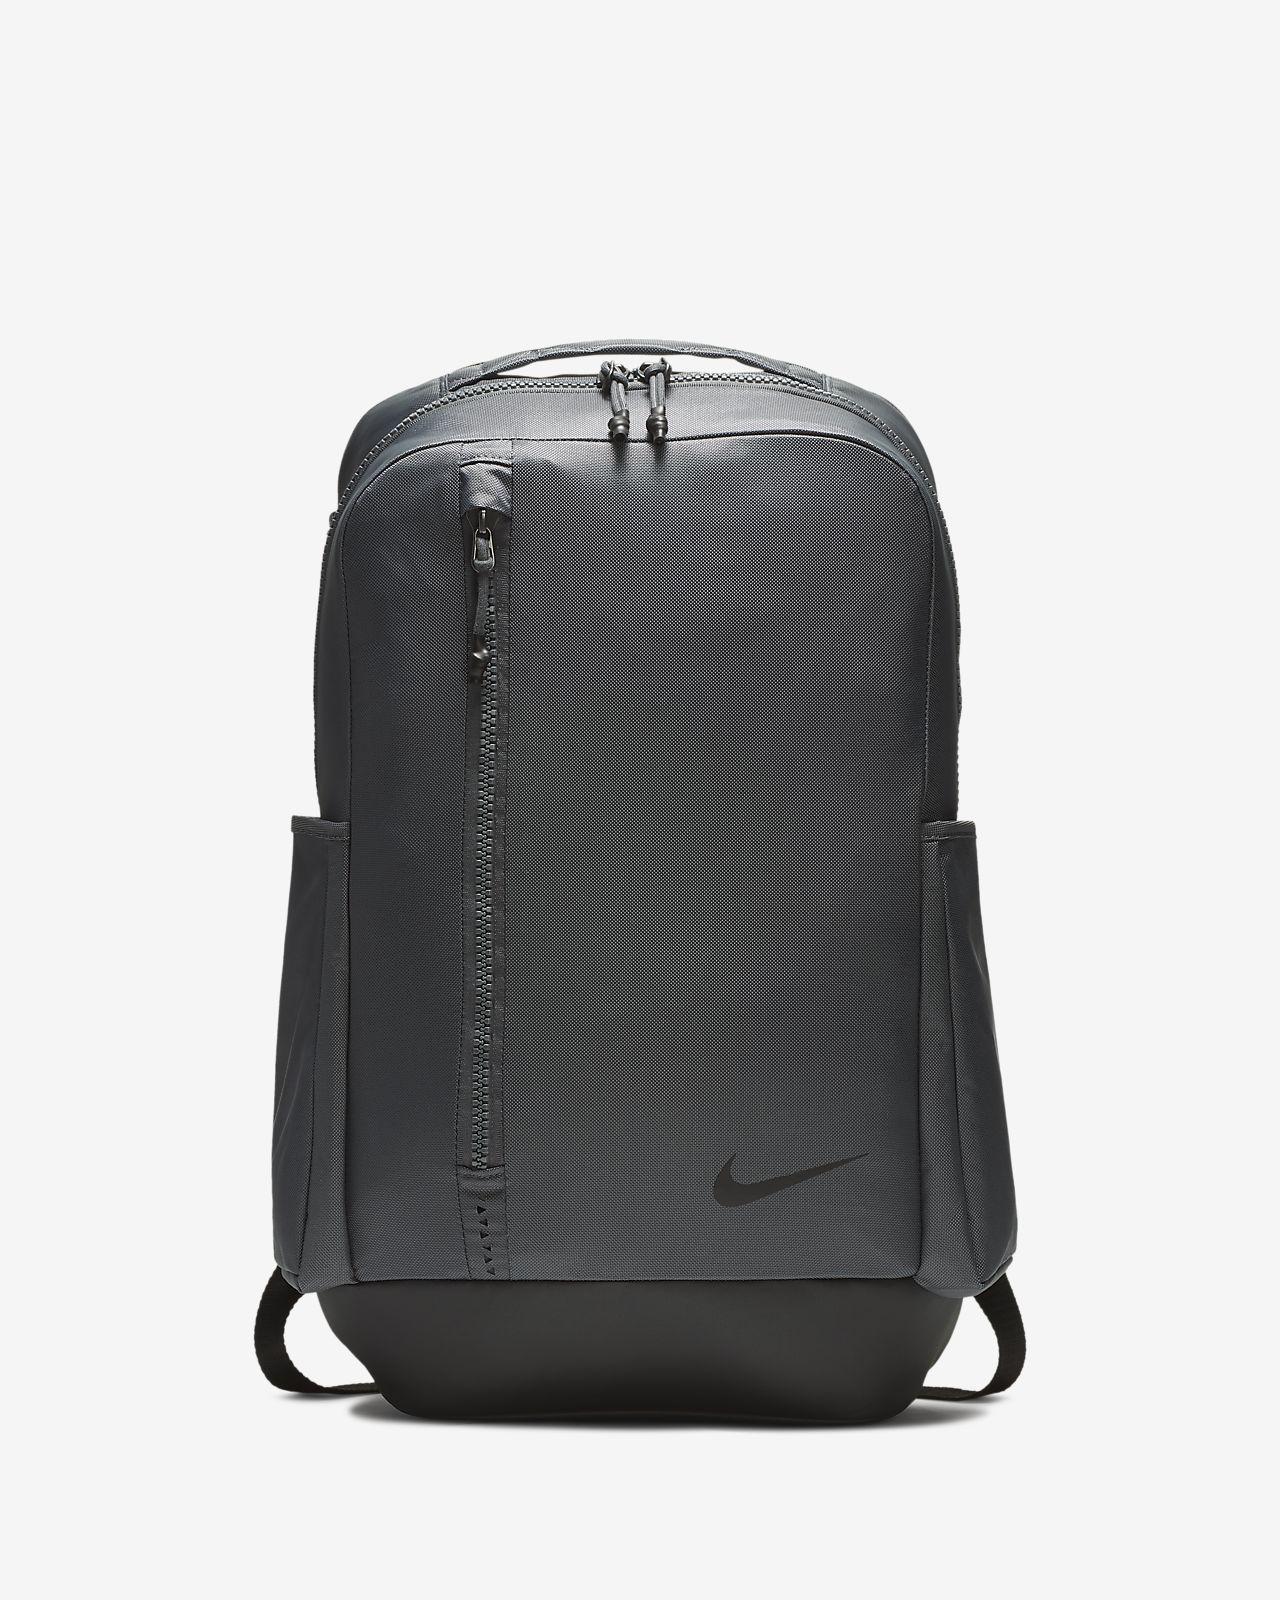 Plecak treningowy Nike Vapor Power 2.0